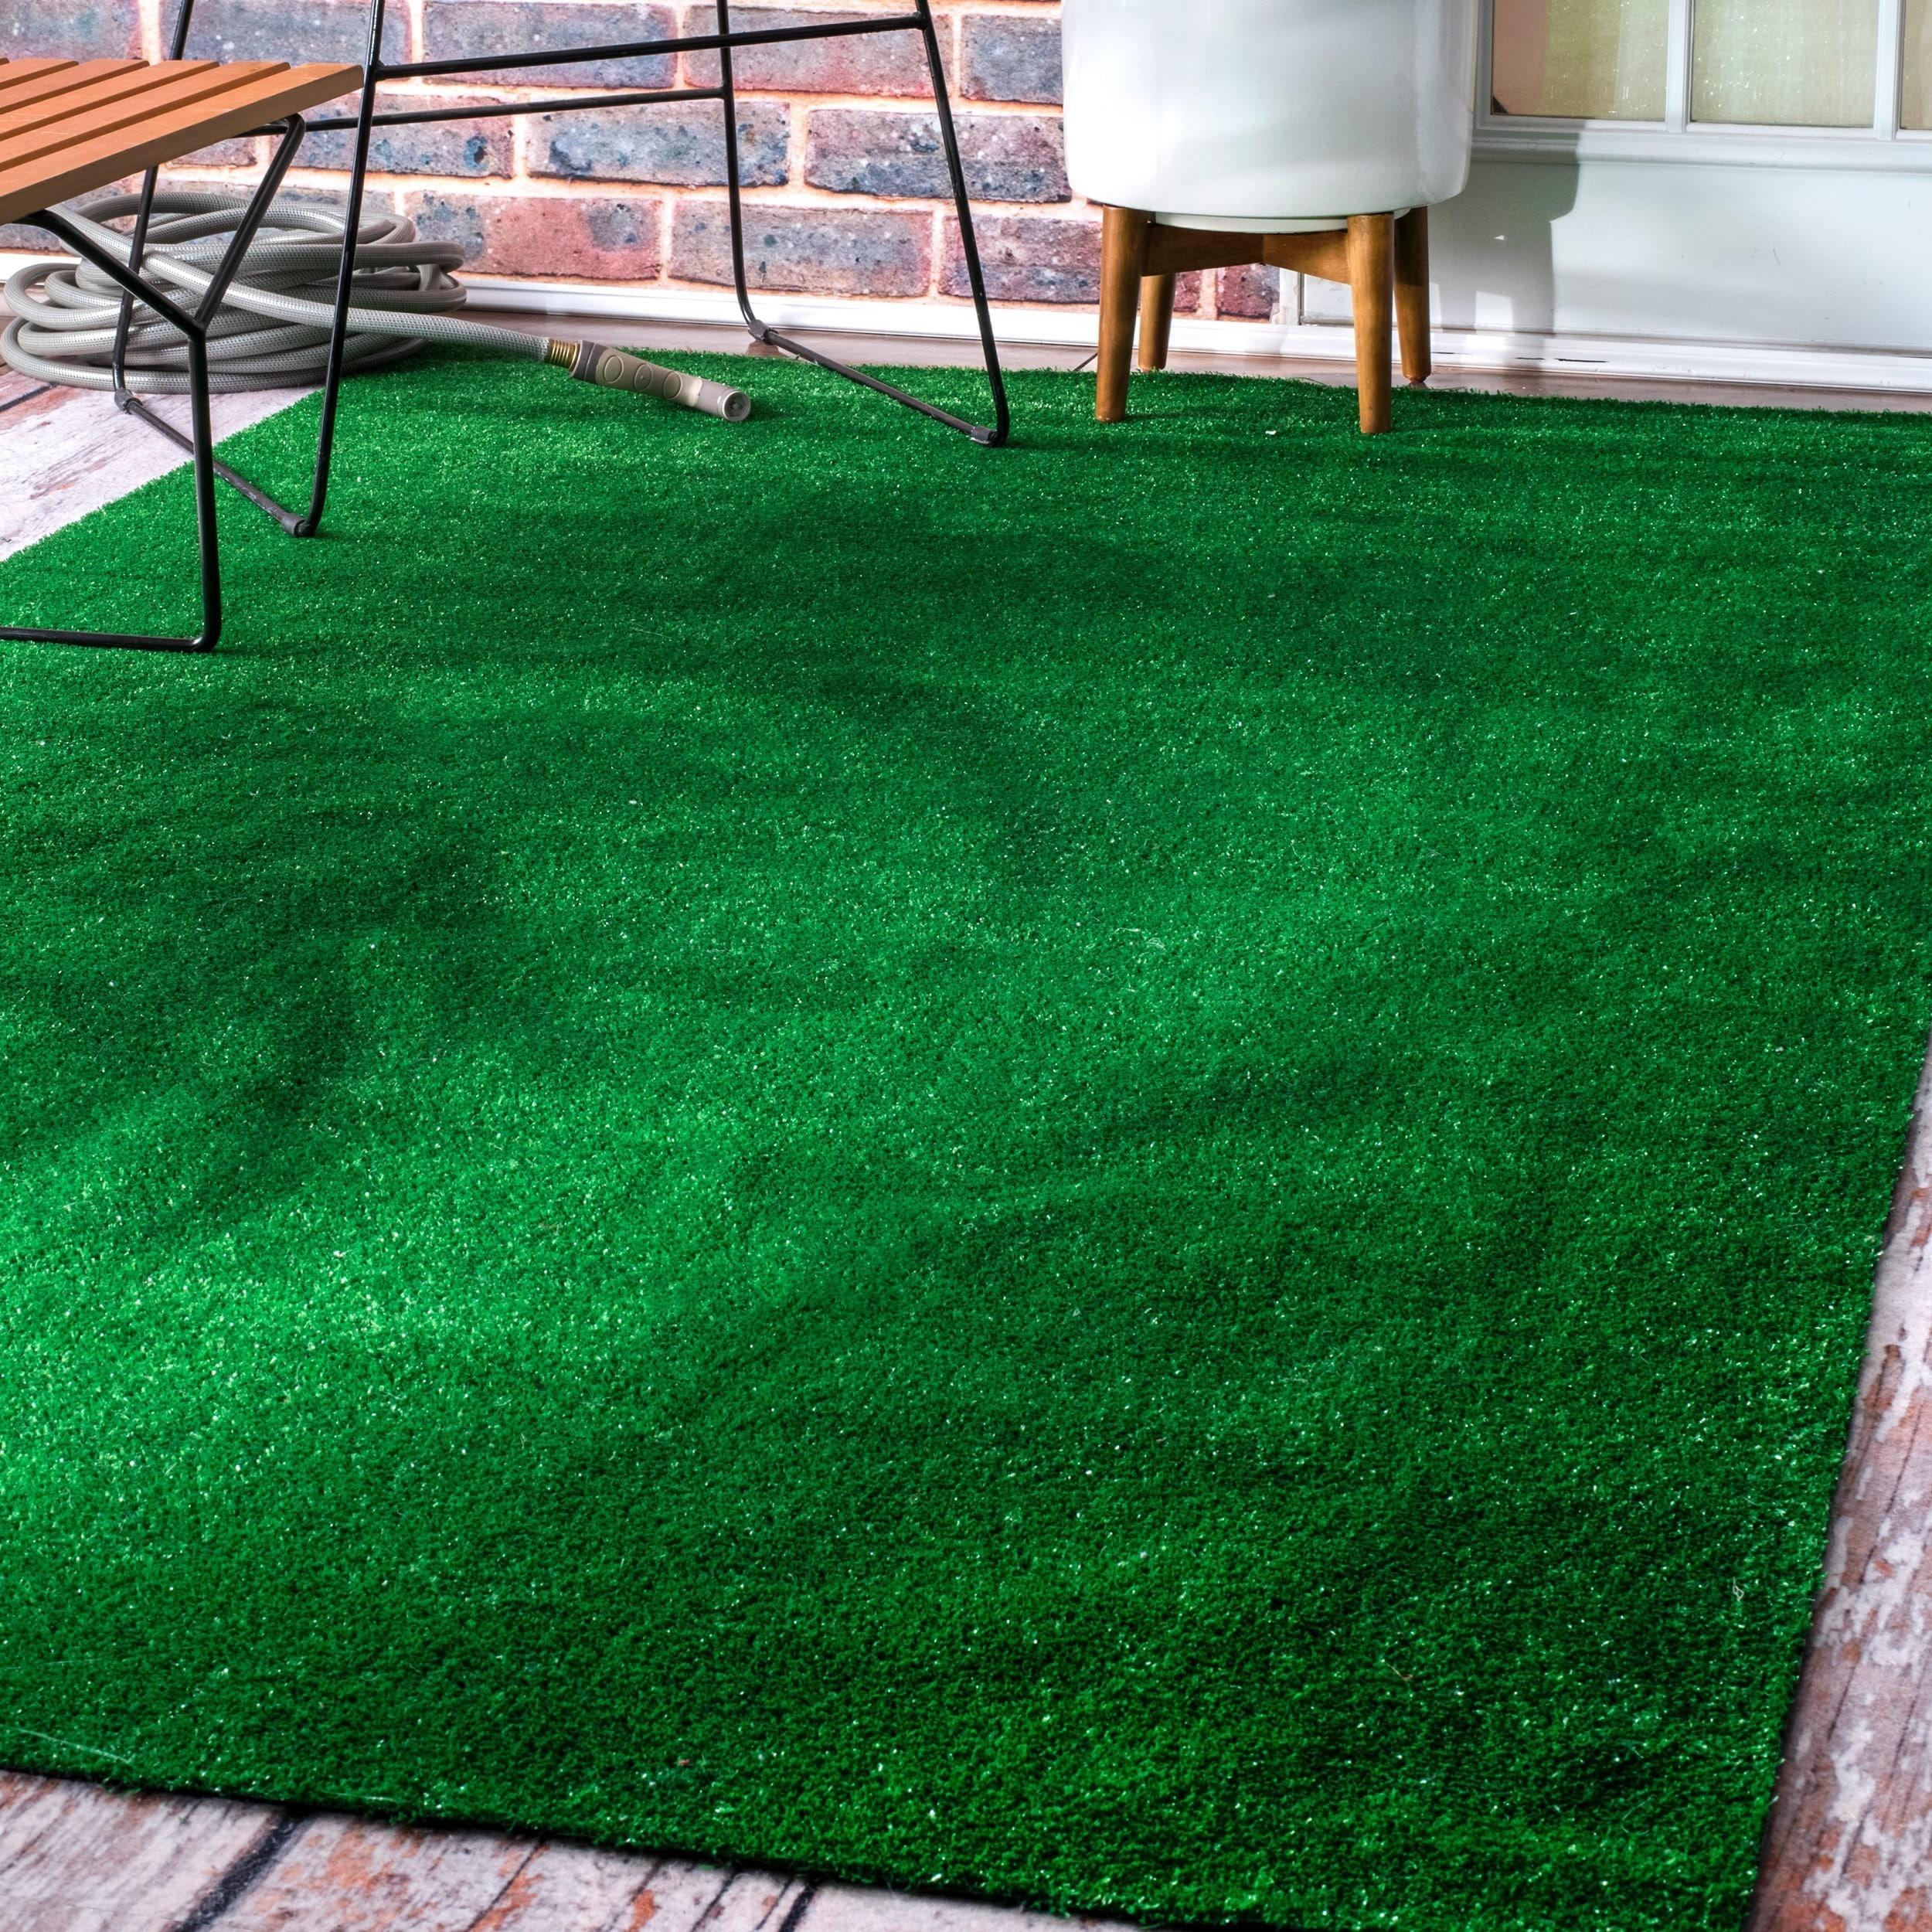 Astro Turf Carpet 4500 Home Depot Carpet